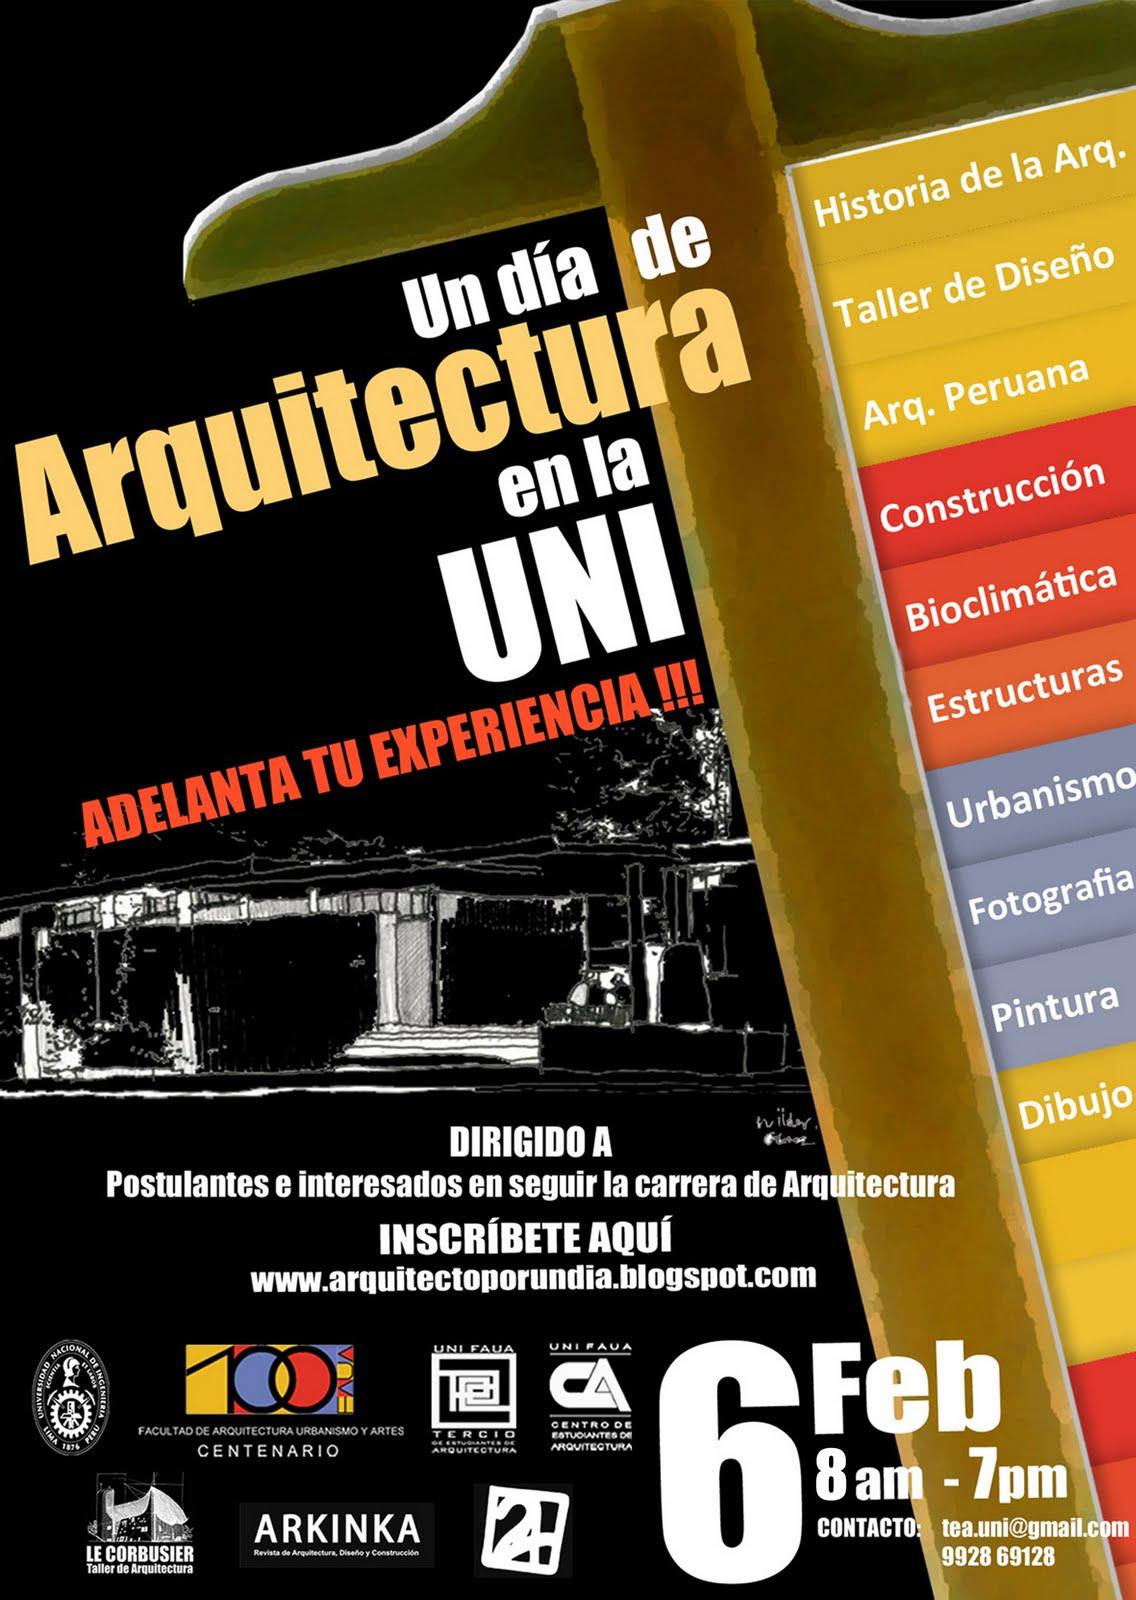 Bit cora arquitectura peruana un d a de arquitectura en for Materias de la carrera arquitectura